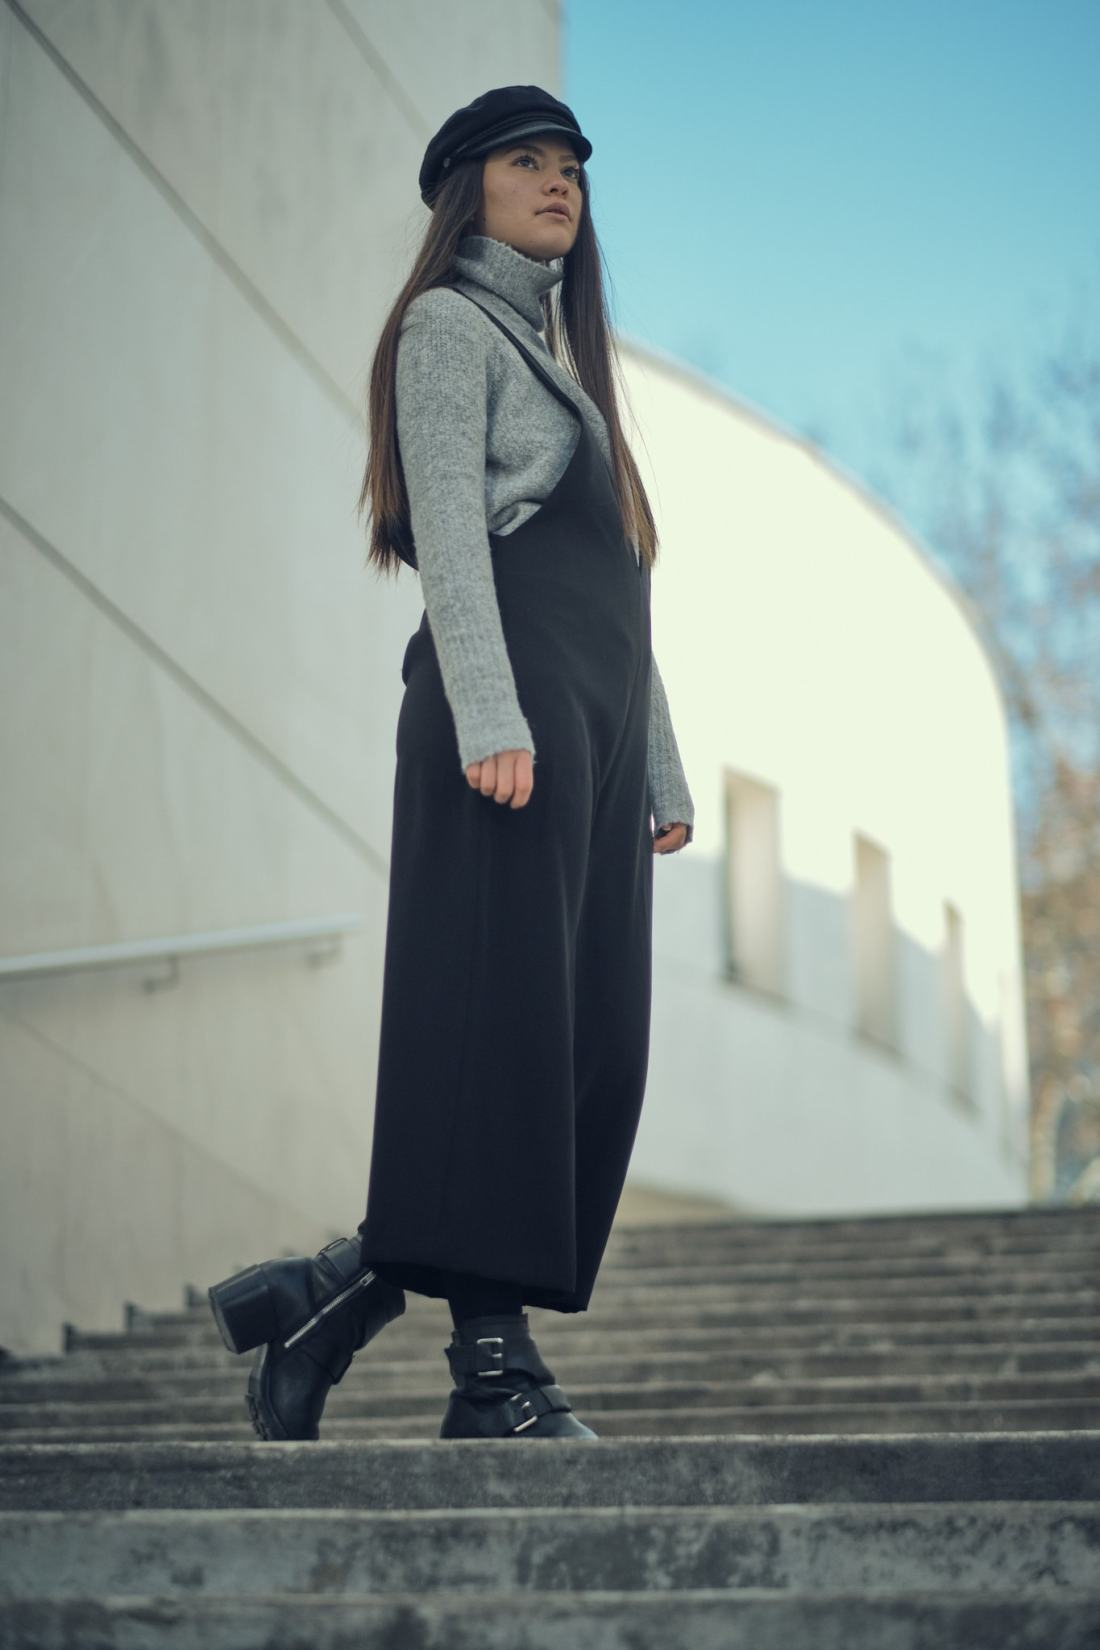 casquette-marin-fashion-blogger-blog-mode-paris-8-min